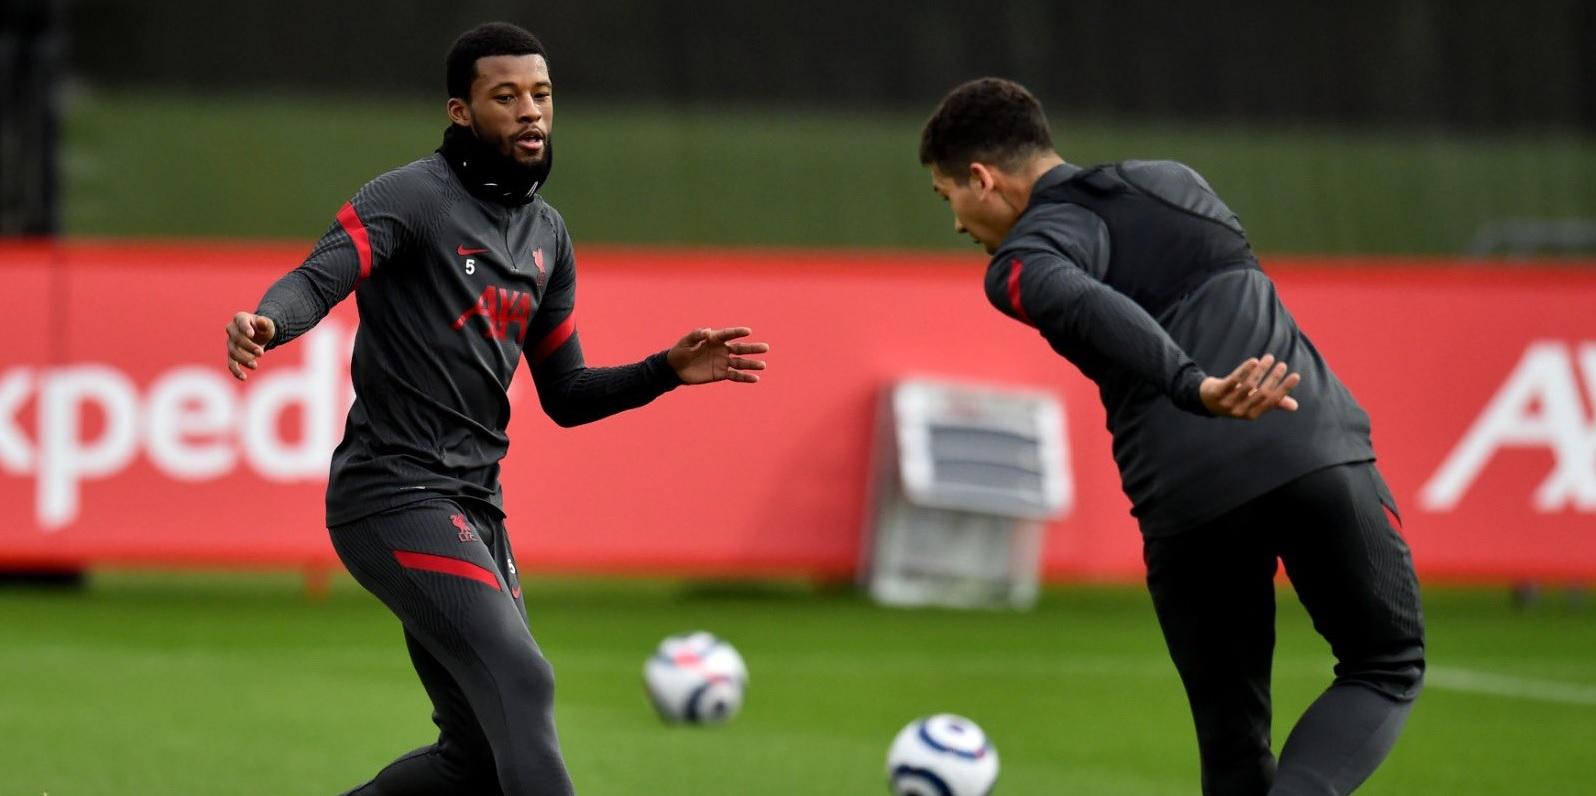 Gini Wijnaldum keen on Liverpool stay; midfielder still yet to put pen to paper – report